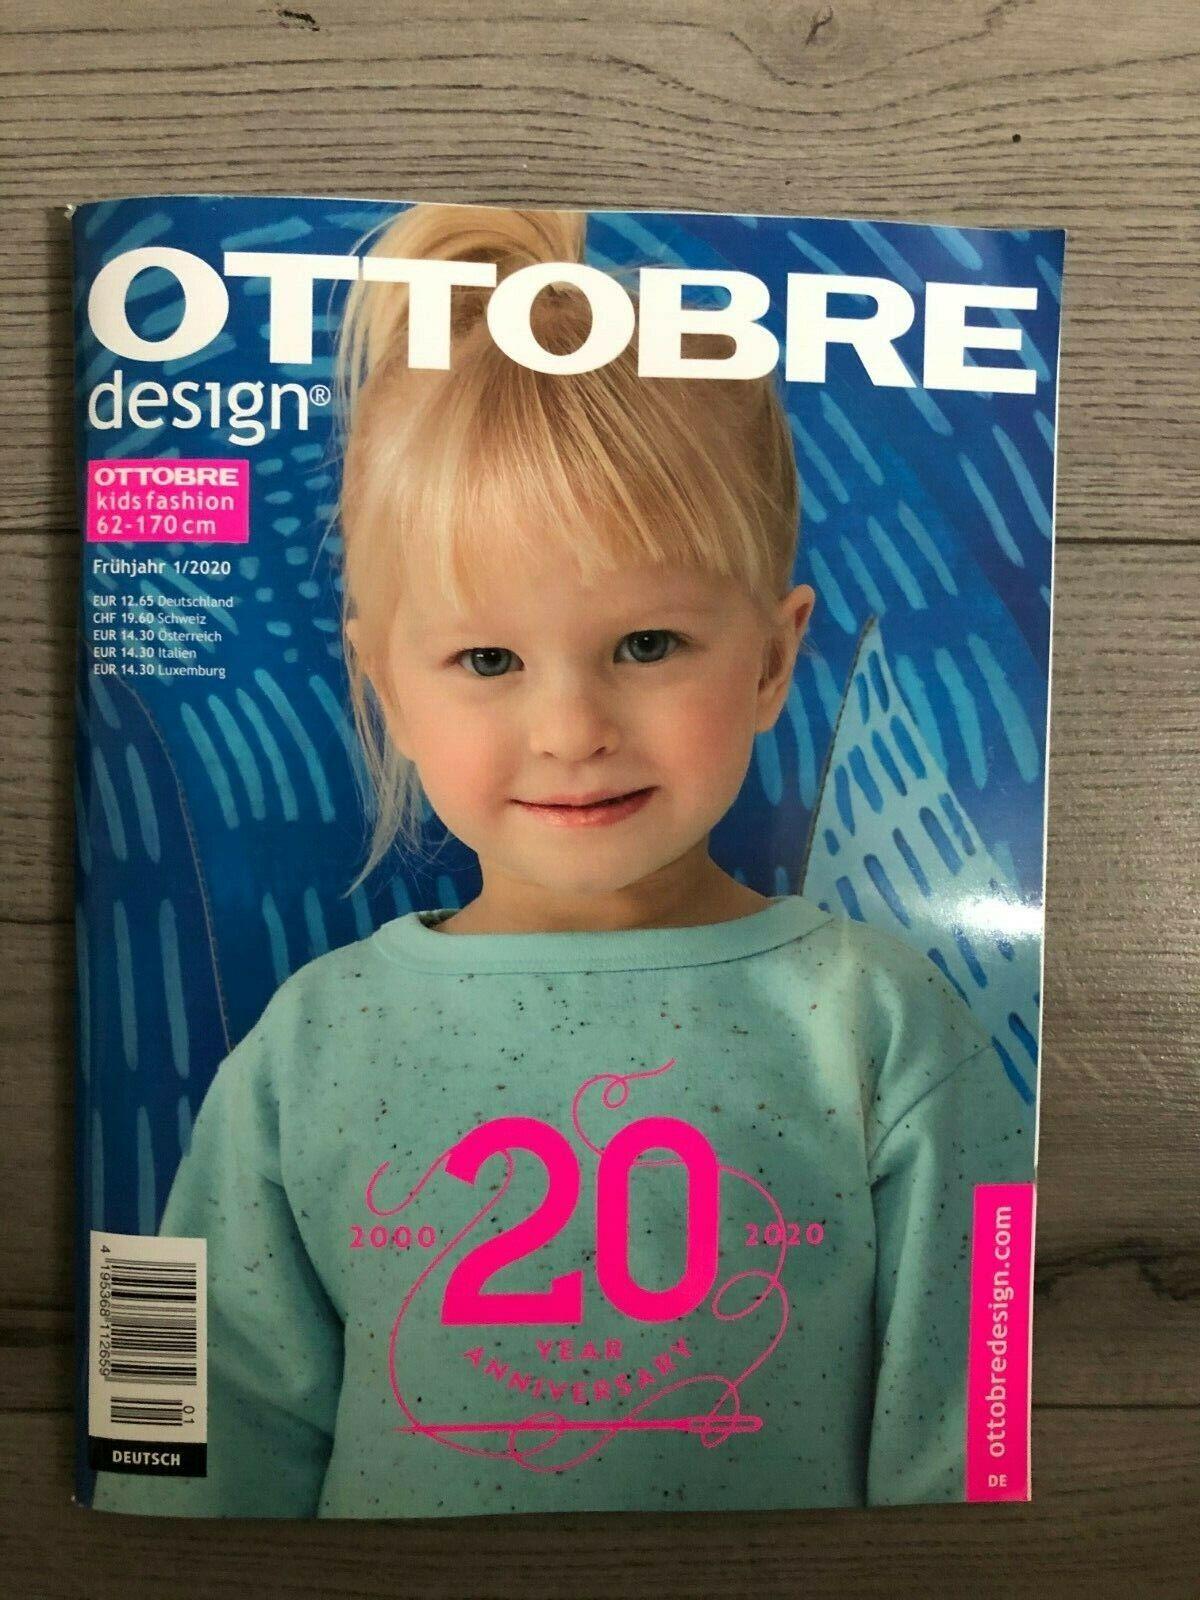 TOP OTTOBRE Kids Fashion Herbst 4//2019  Größen 50-170cm  NEU 1A  abs